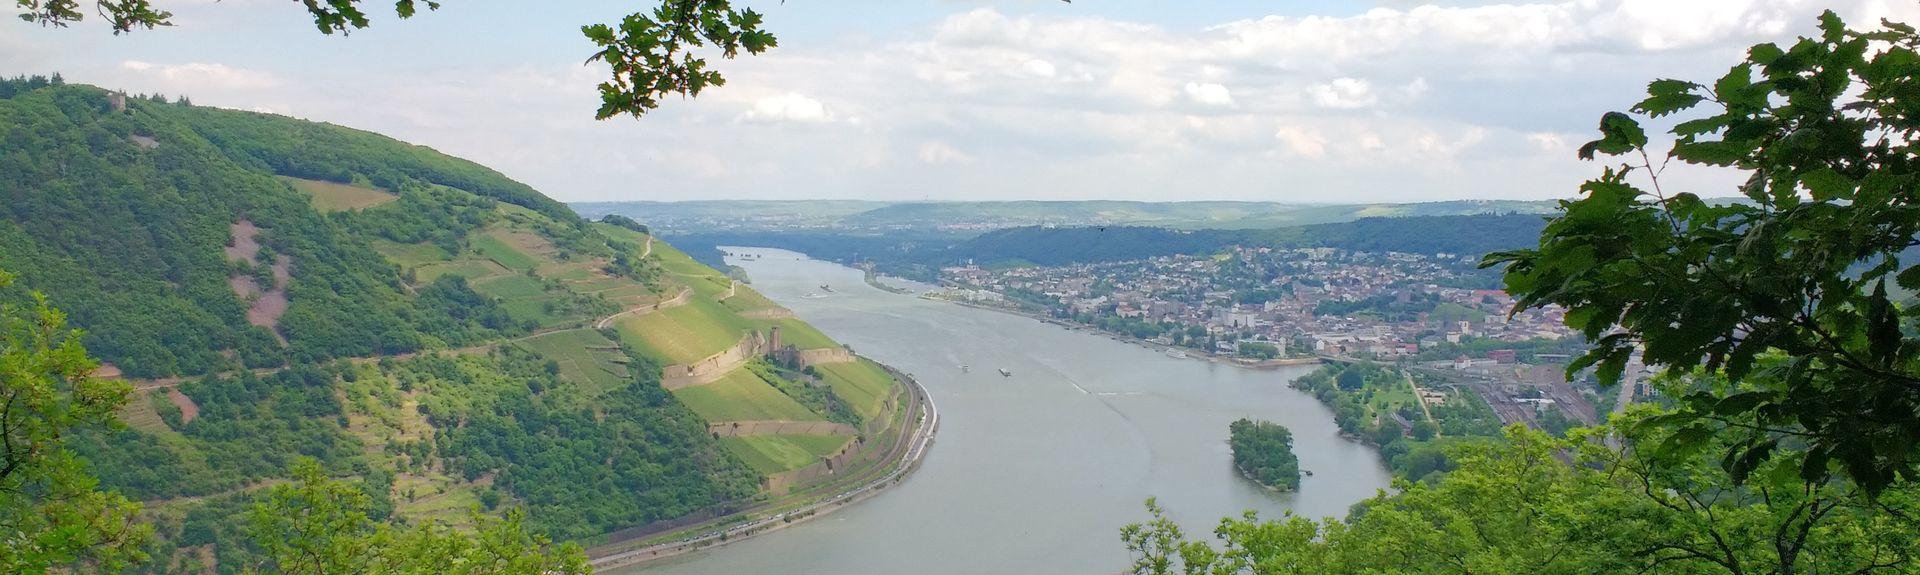 Bingen am Rhein, RijnlandPalts, Duitsland